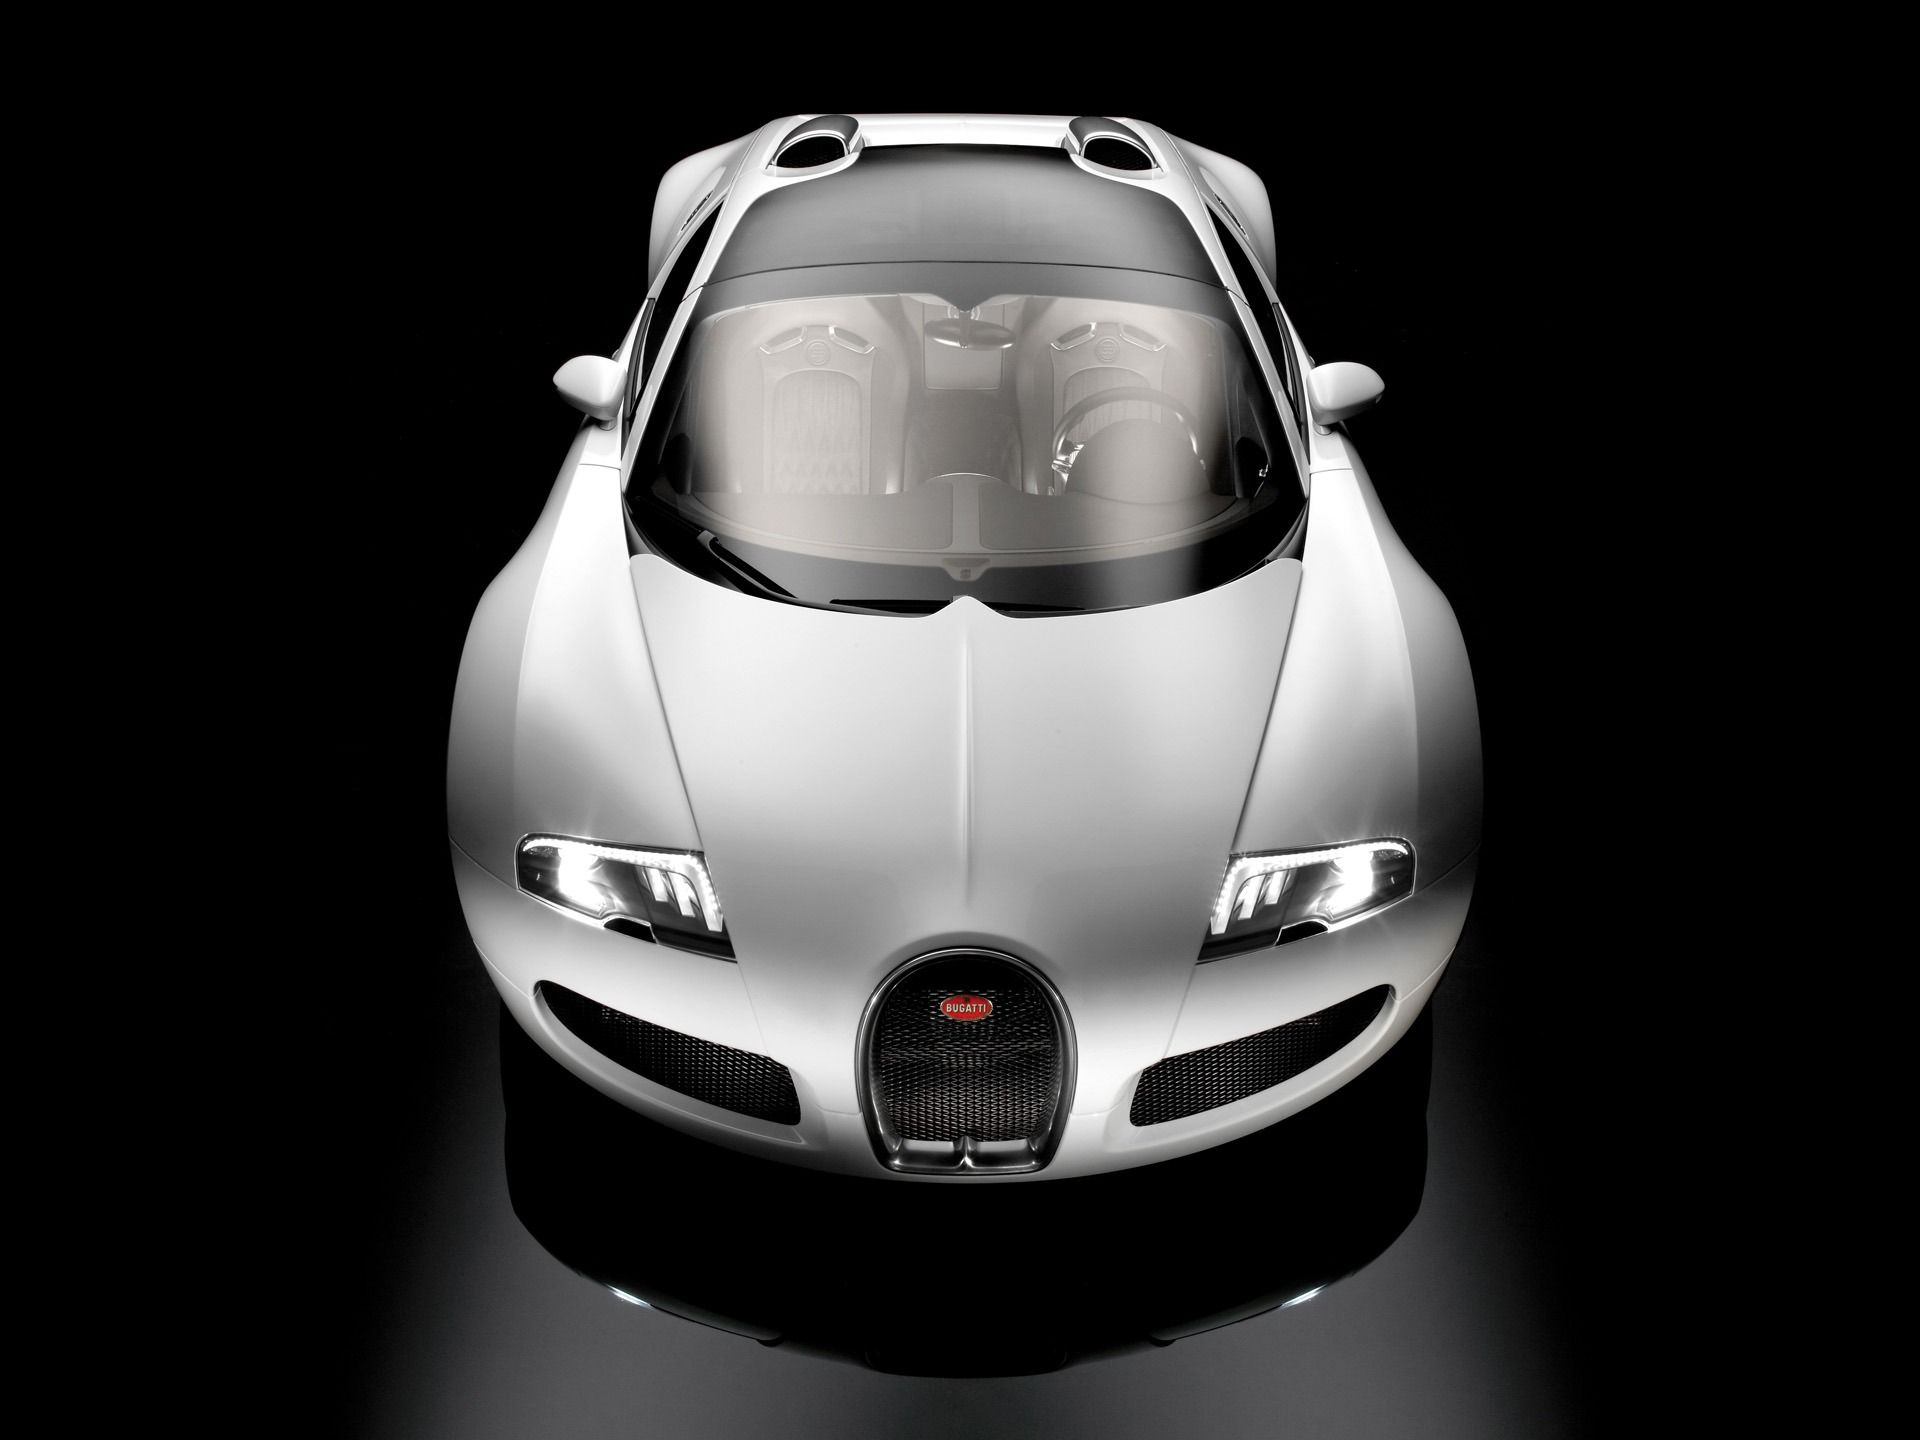 2b1a77e4f89dd003ed5c0954d39881db Wonderful Bugatti Veyron Grand Sport Vitesse Mansory Vivere 2014 Cars Trend